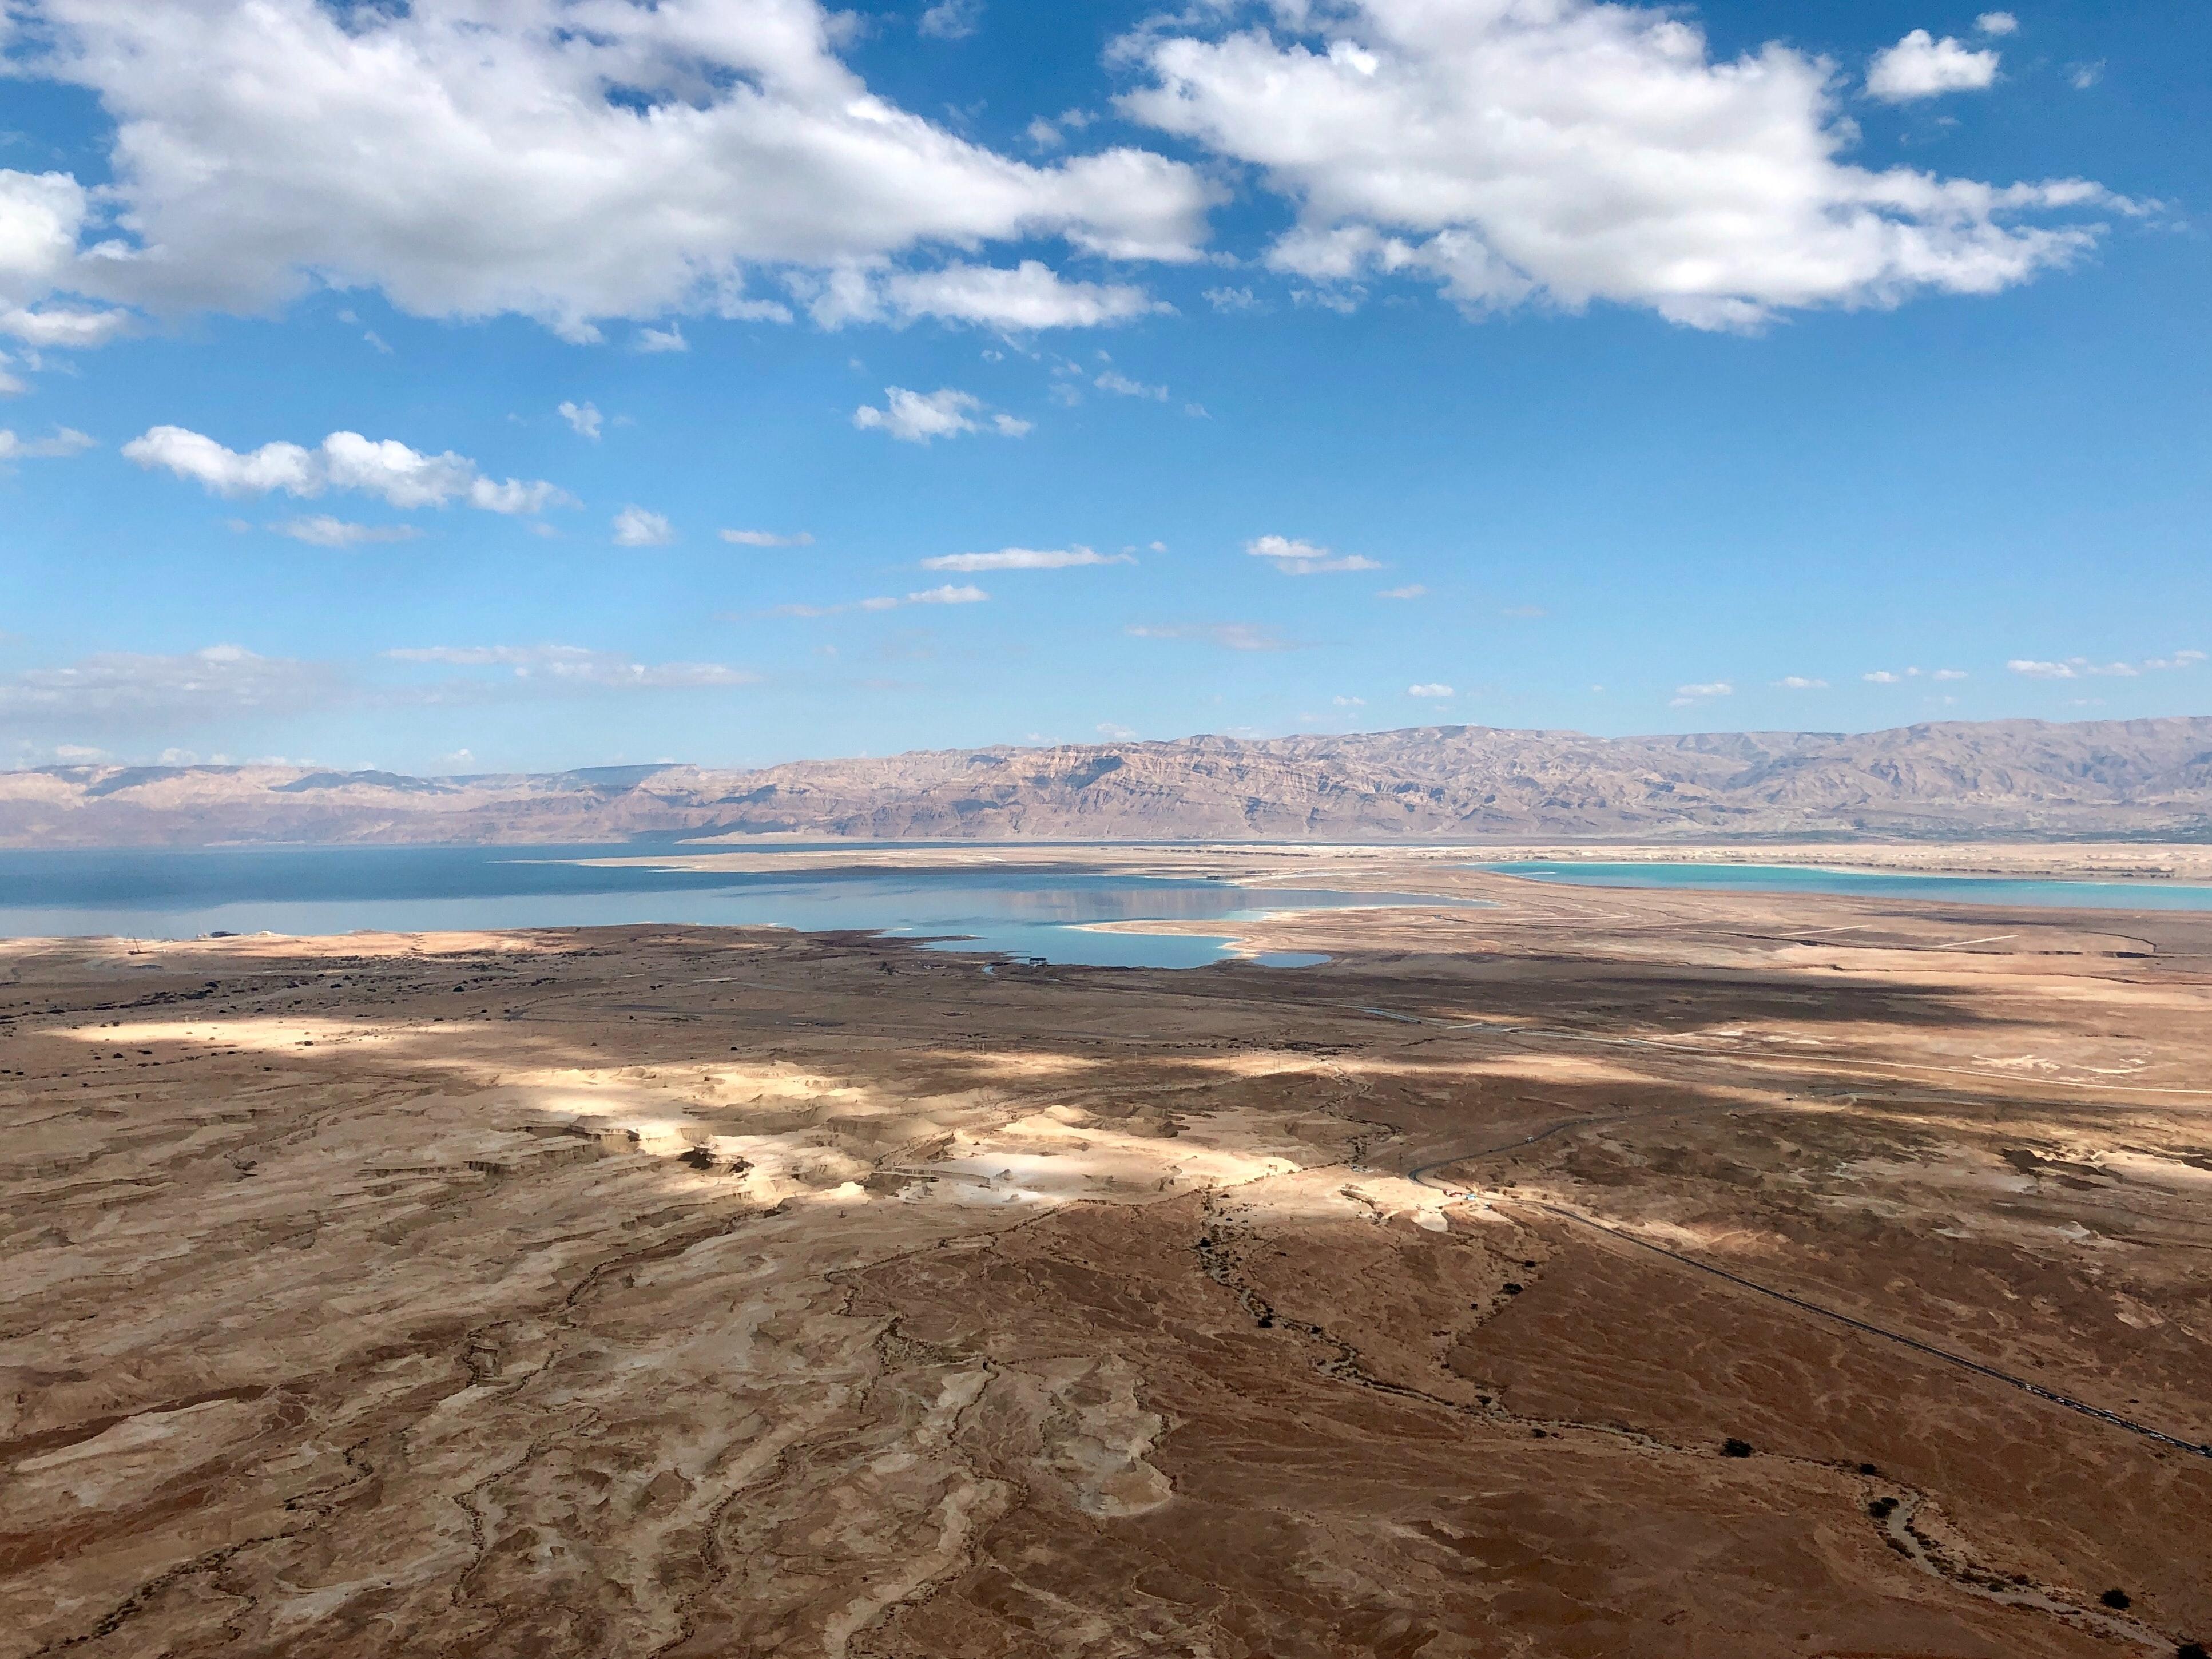 Mar Morto, visto de Masada, Israel. Foto de Andrea Rapuzzi | Unsplash